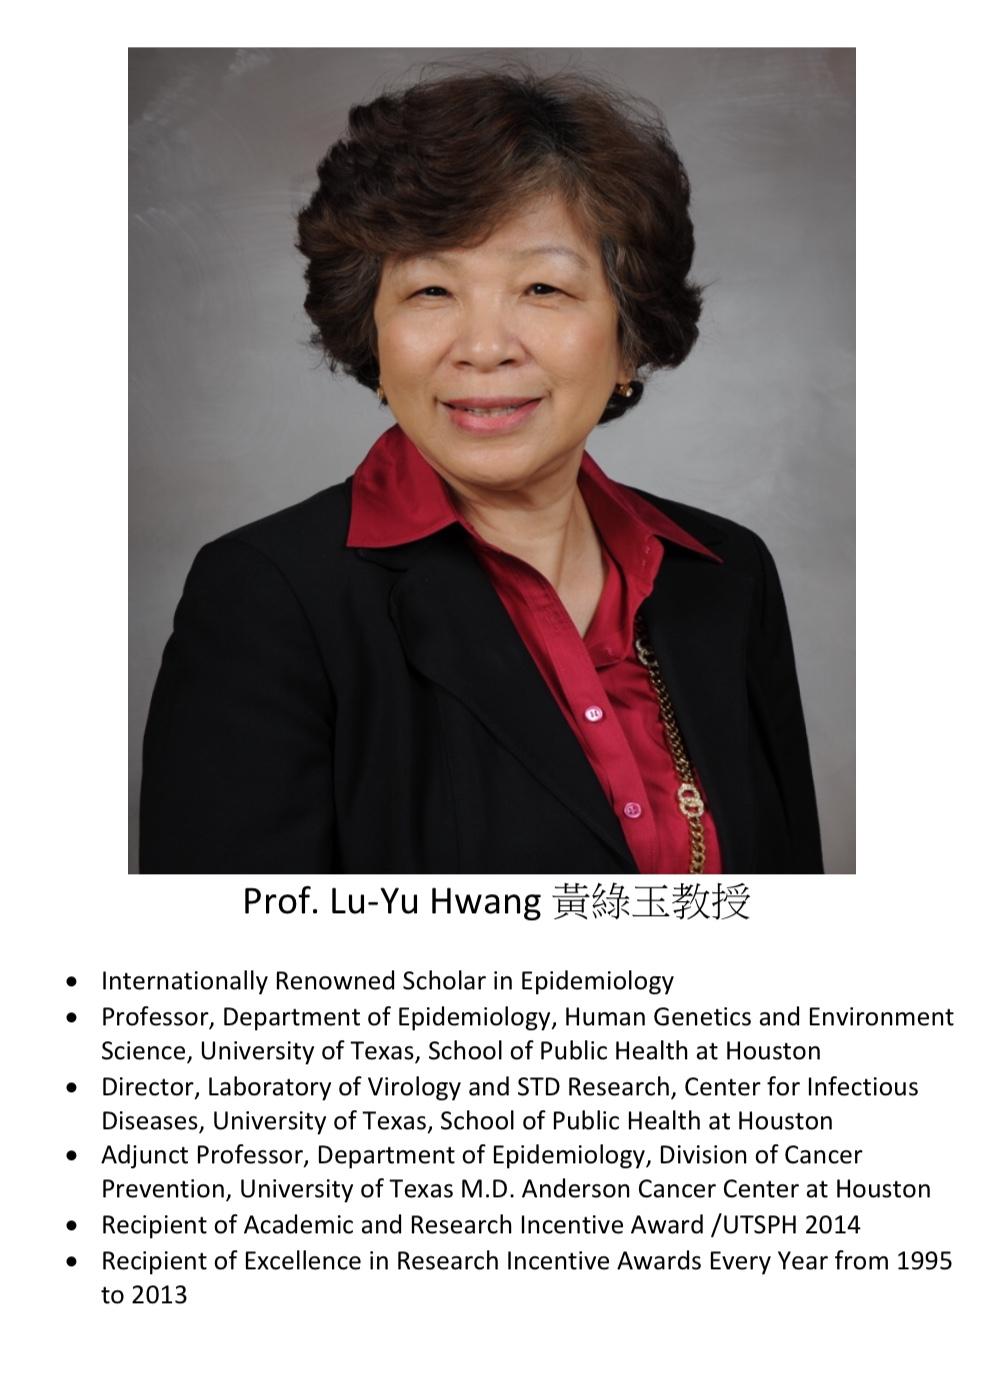 253. Prof. Lu-Yu Hwang 黃綠玉教授